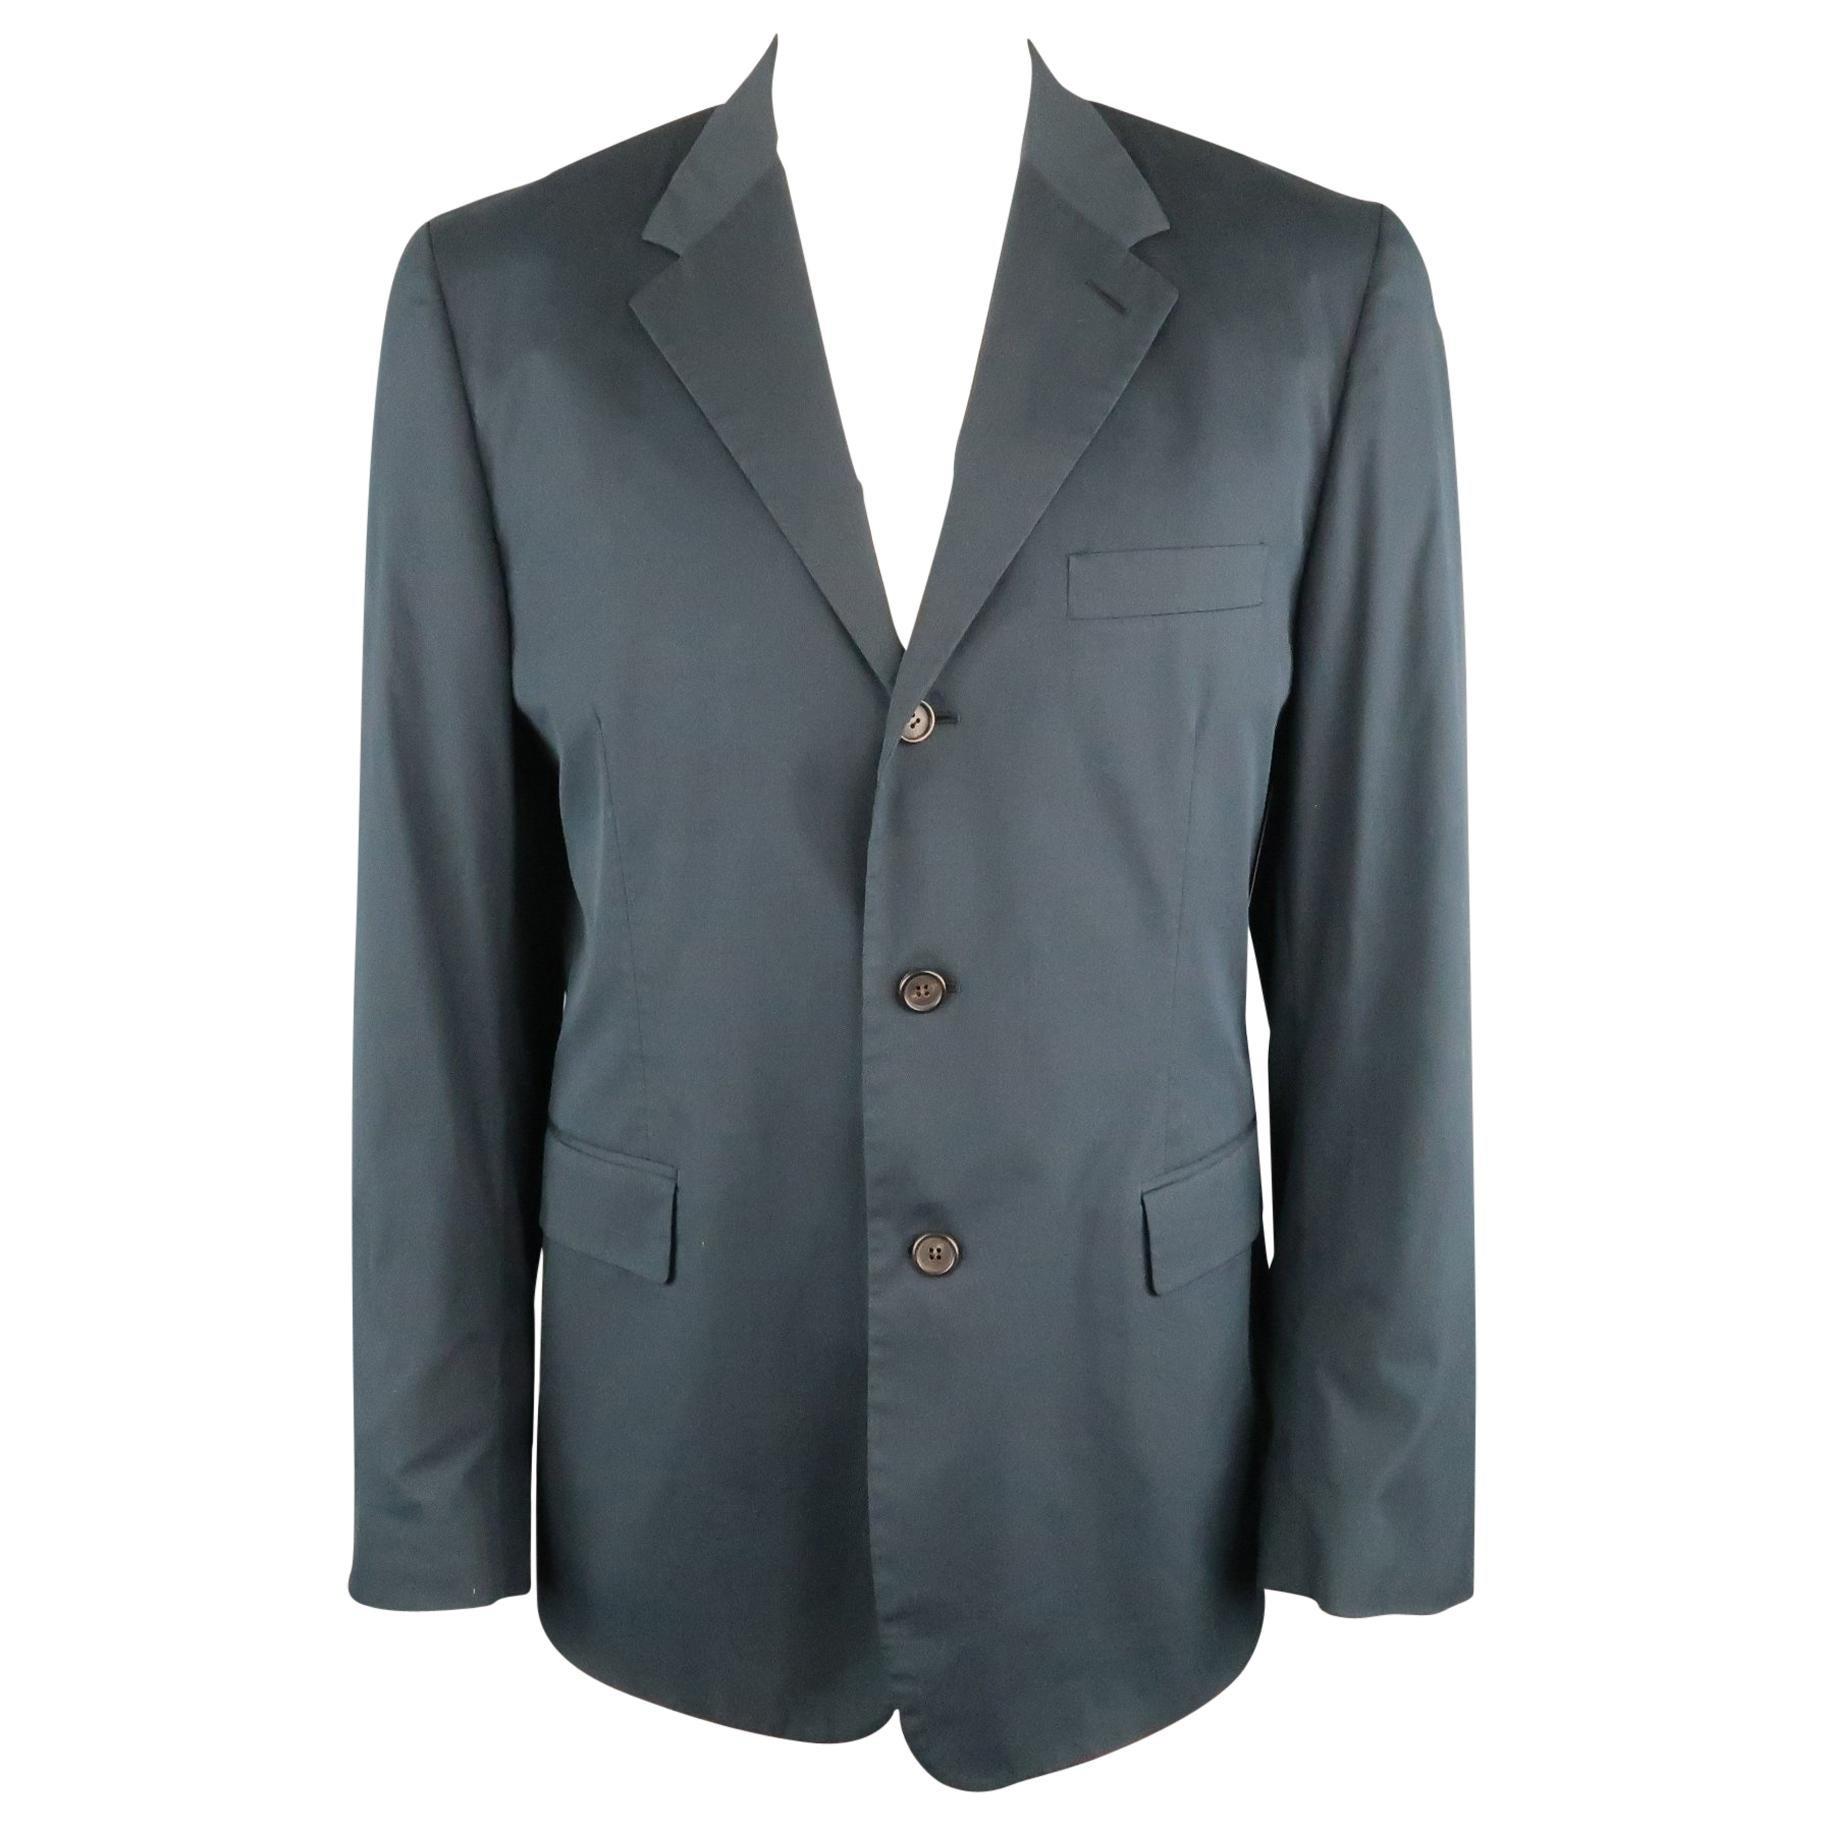 PRADA 44 Regular Navy Solid Cotton Blend Notch Lapel Sport Coat